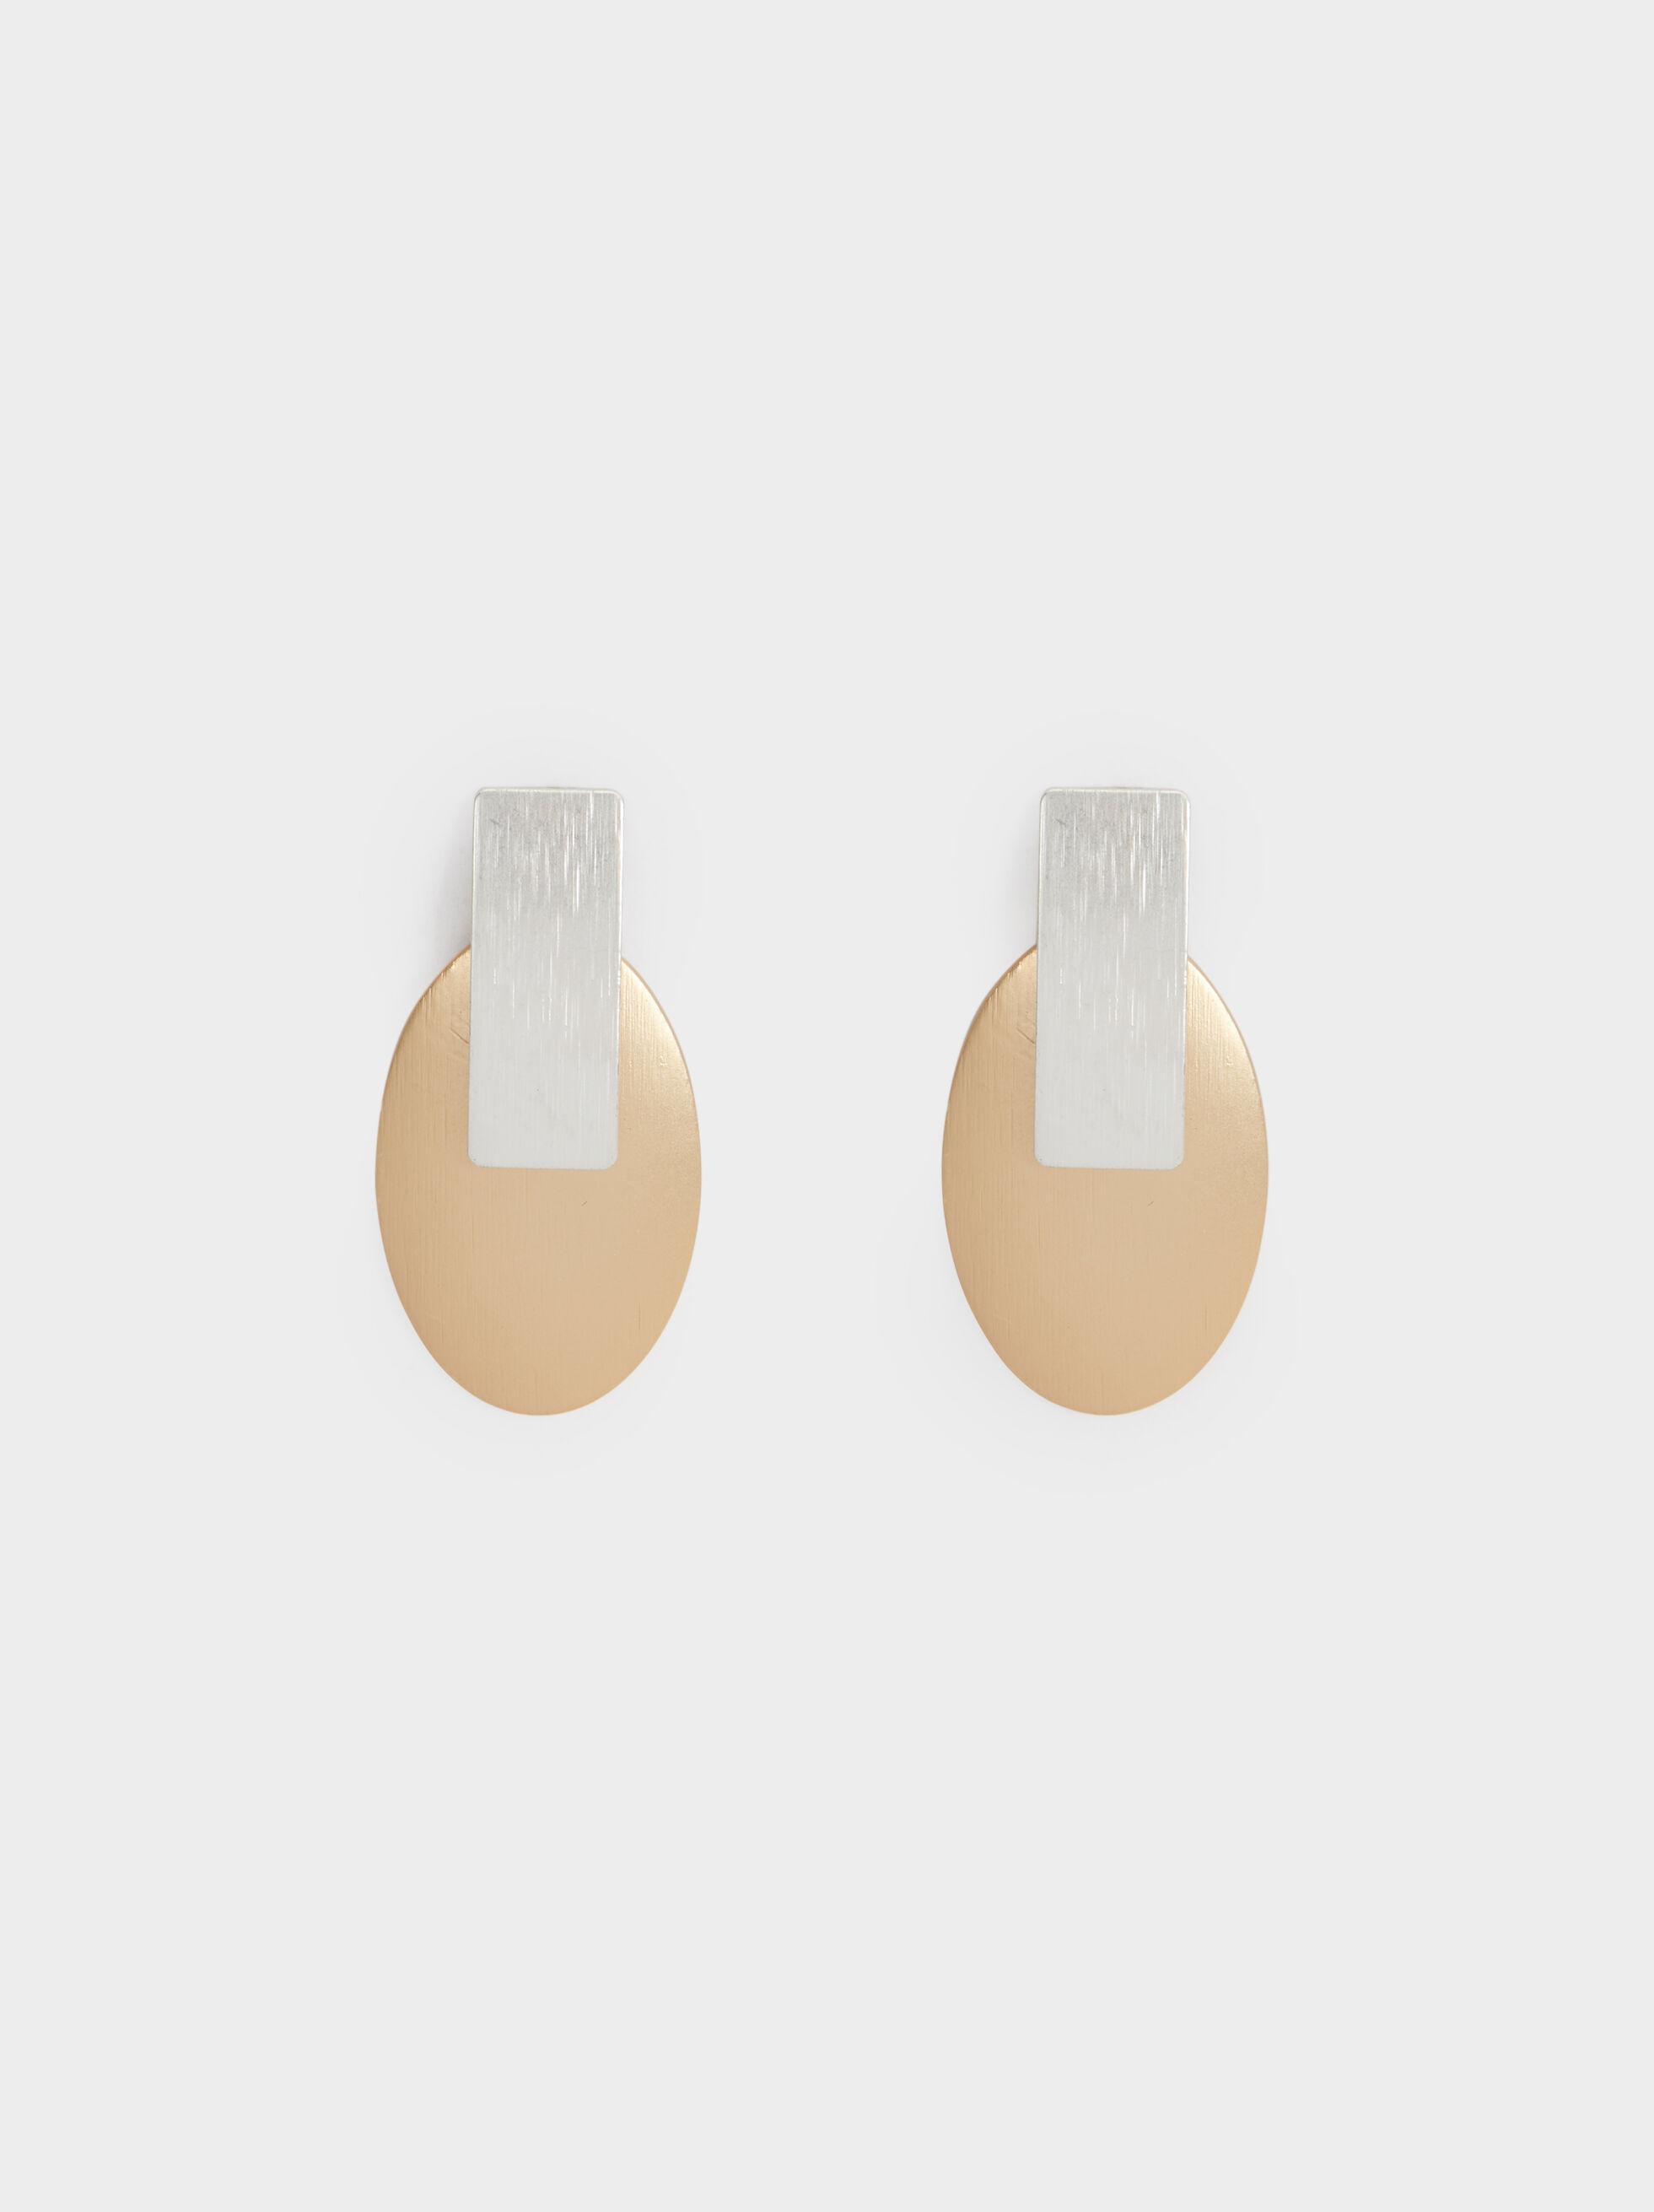 Medium Two-Tone Earrings, , hi-res